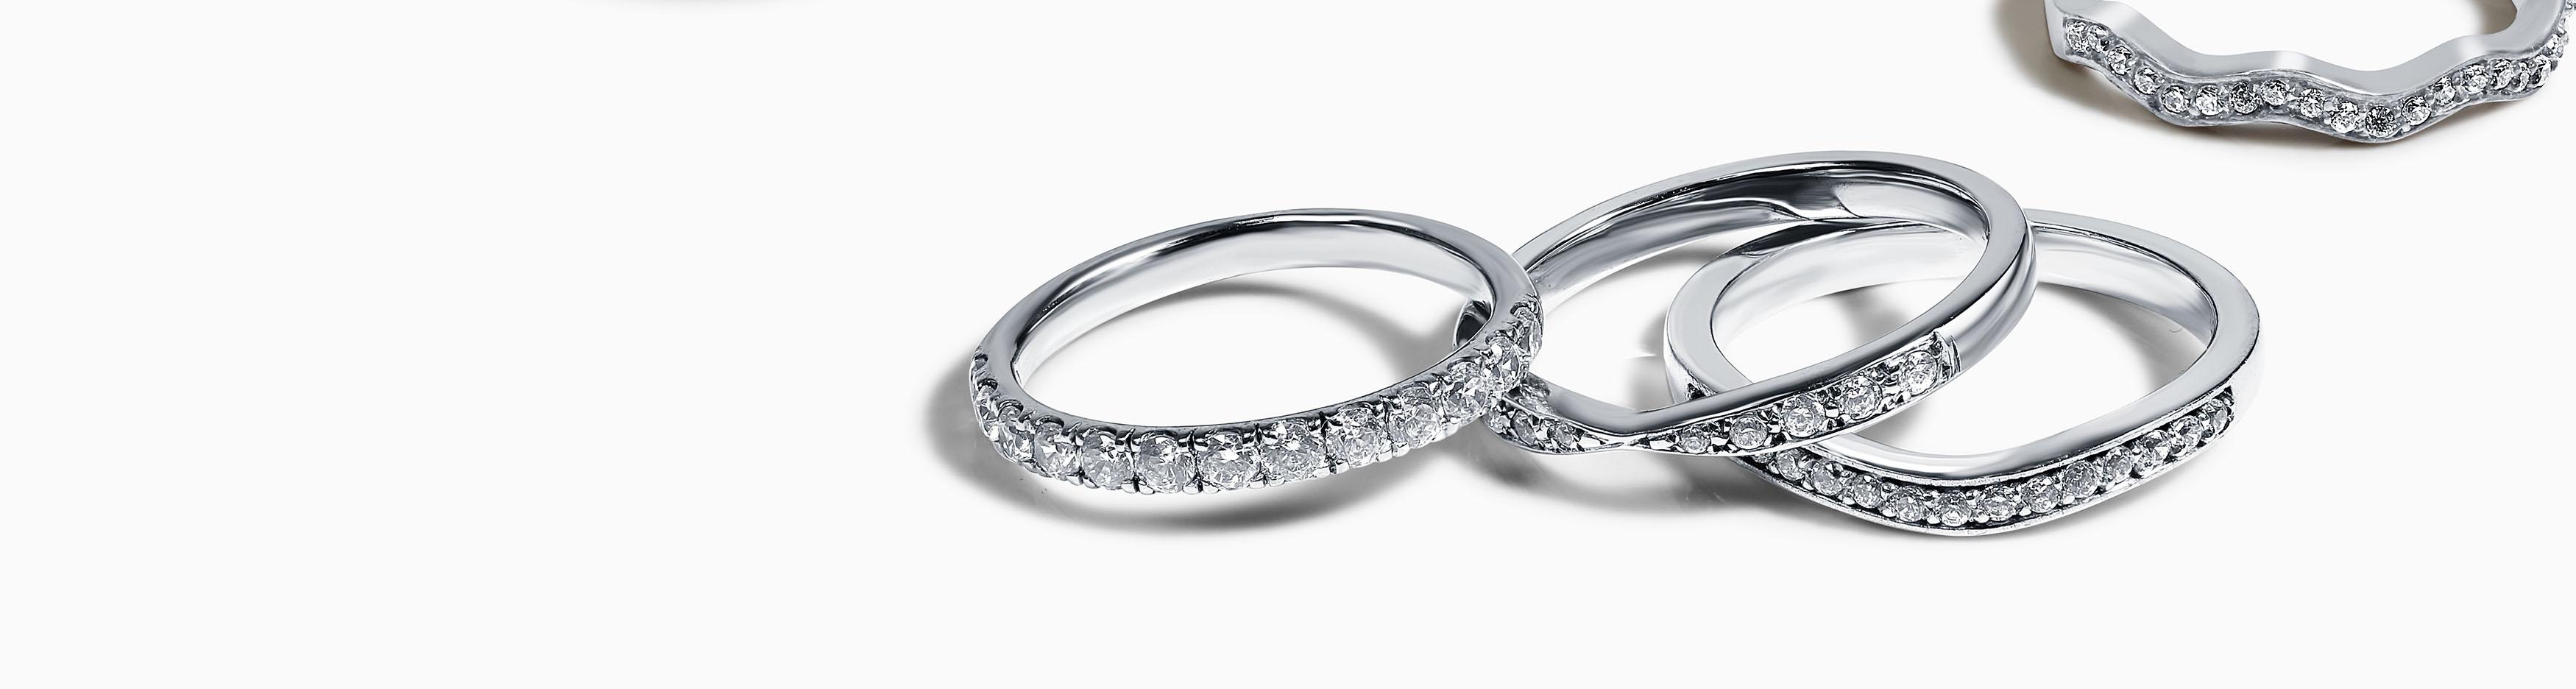 White Gold Eternity Ring